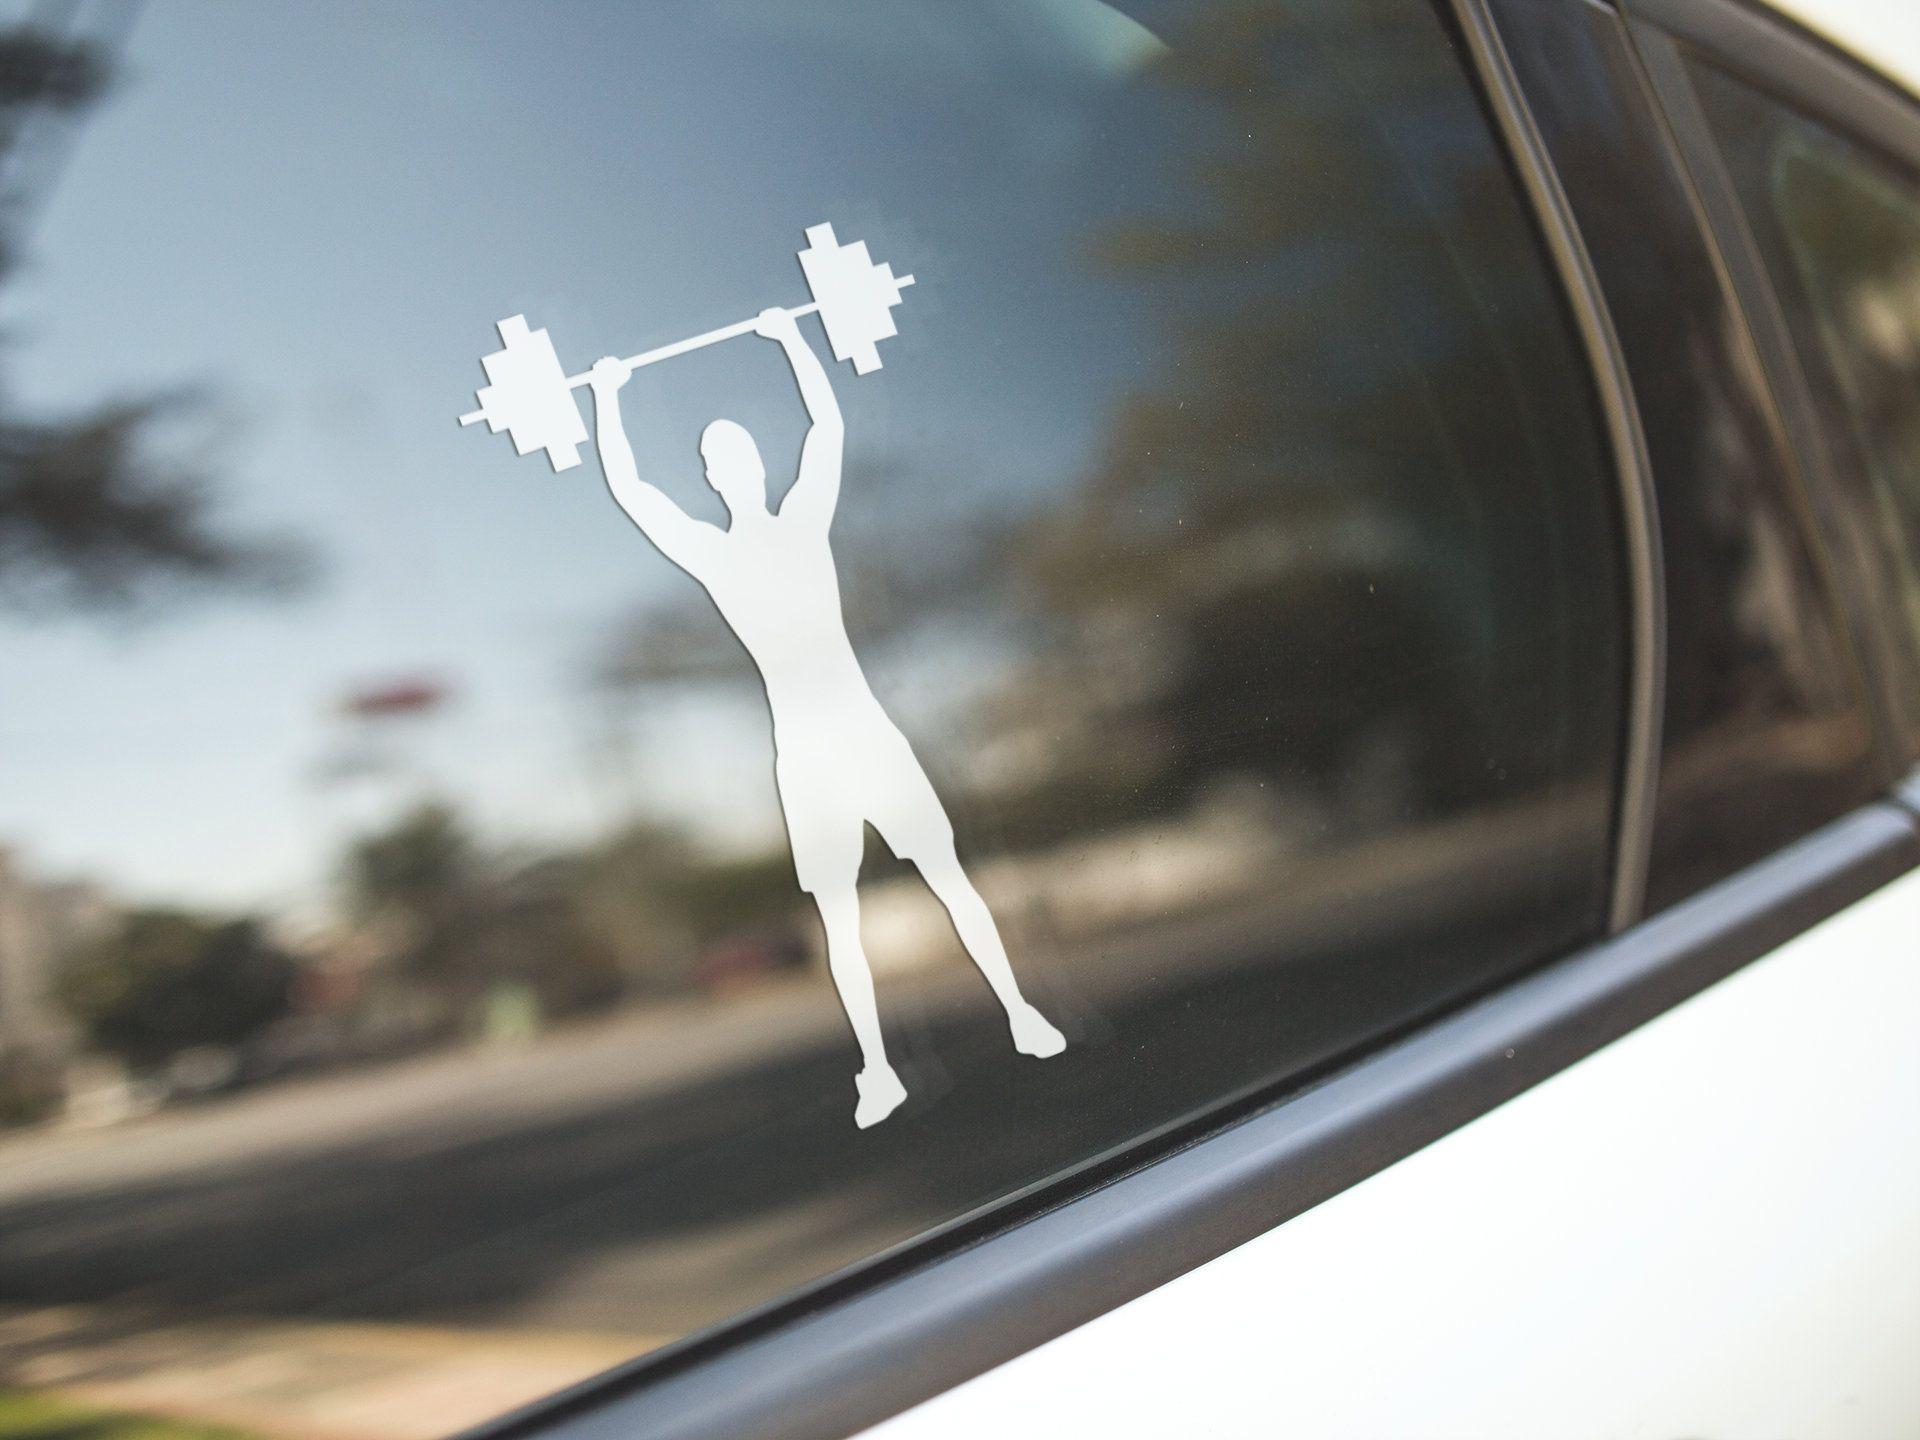 Weightlifter Weightlifting Weight Lift Personal Strength Etsy In 2020 Window Art Art Gift Vinyl Sticker [ 1440 x 1920 Pixel ]